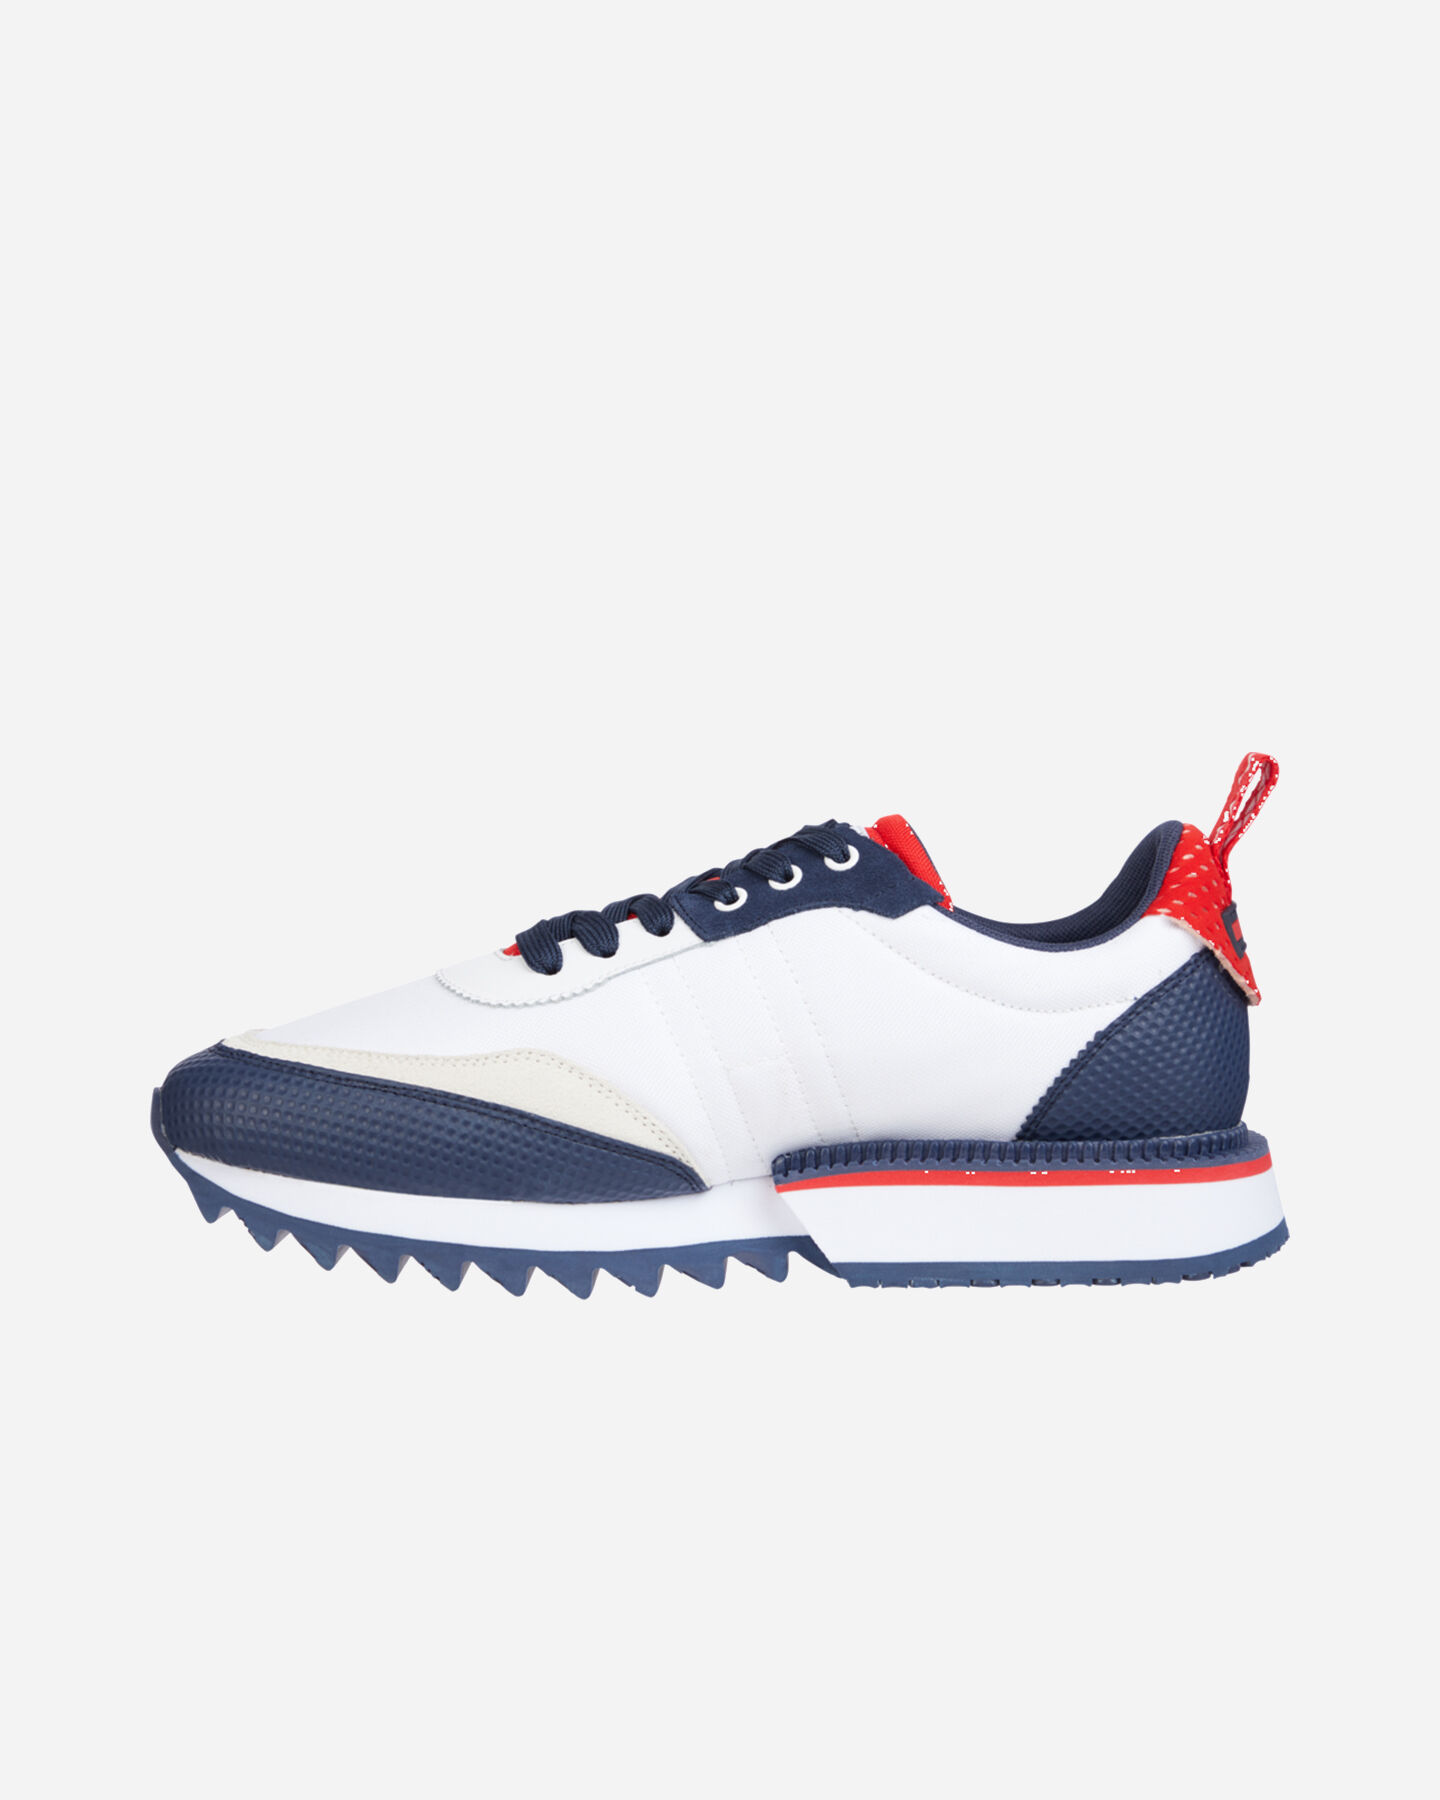 Scarpe sneakers TOMMY HILFIGER FASHION M S4088096 scatto 4